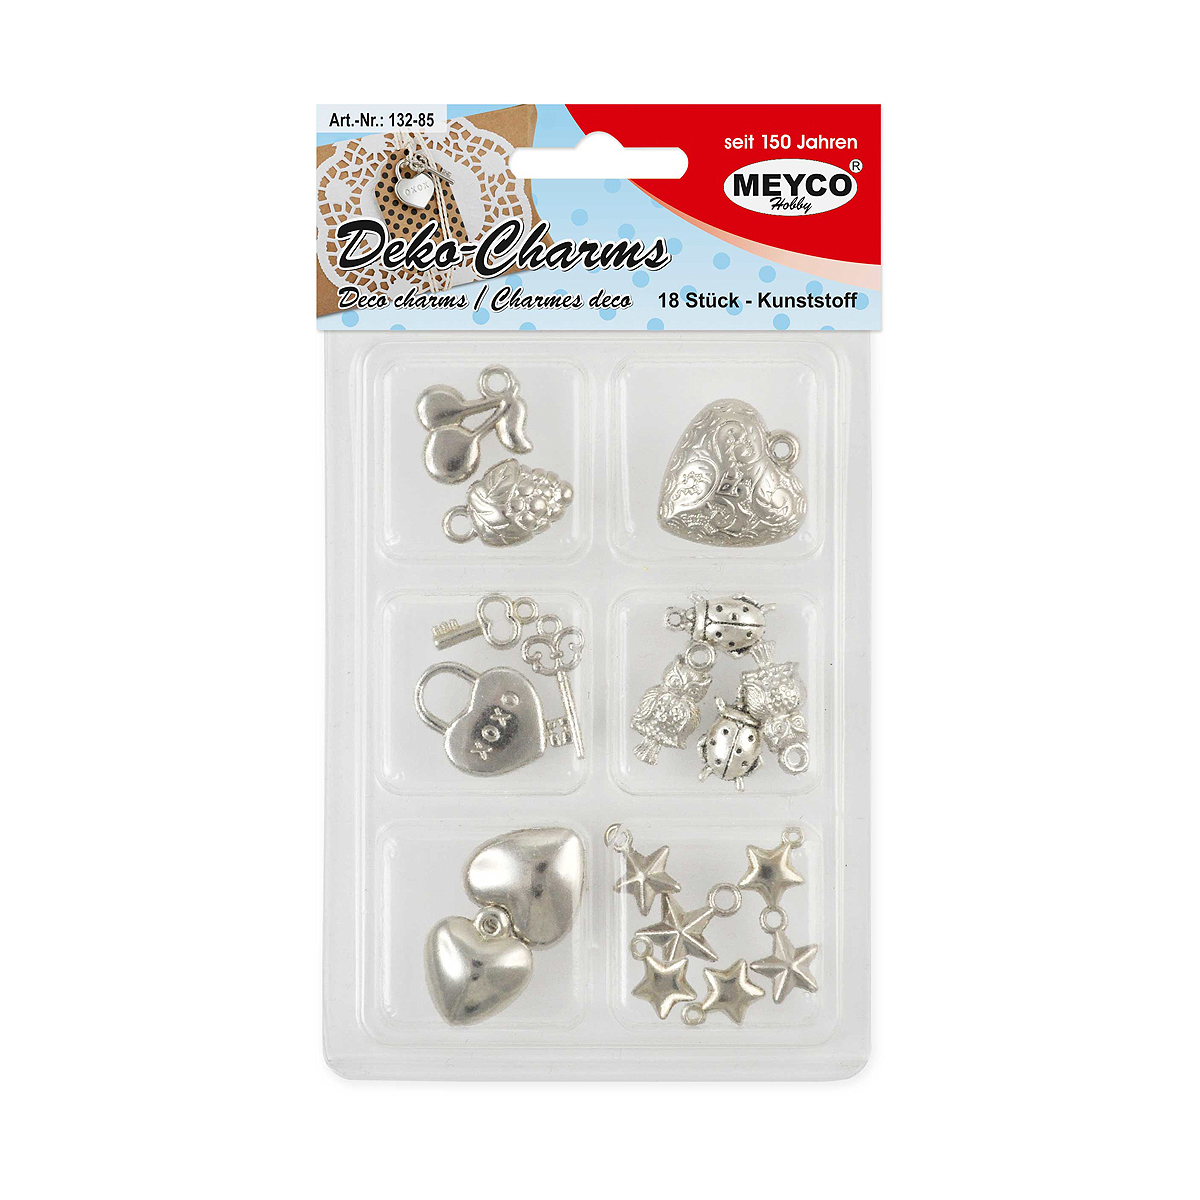 Set Mărgele din Plastic, Deco-Charms, 18 Forme Diverse, Meyco, 132-85